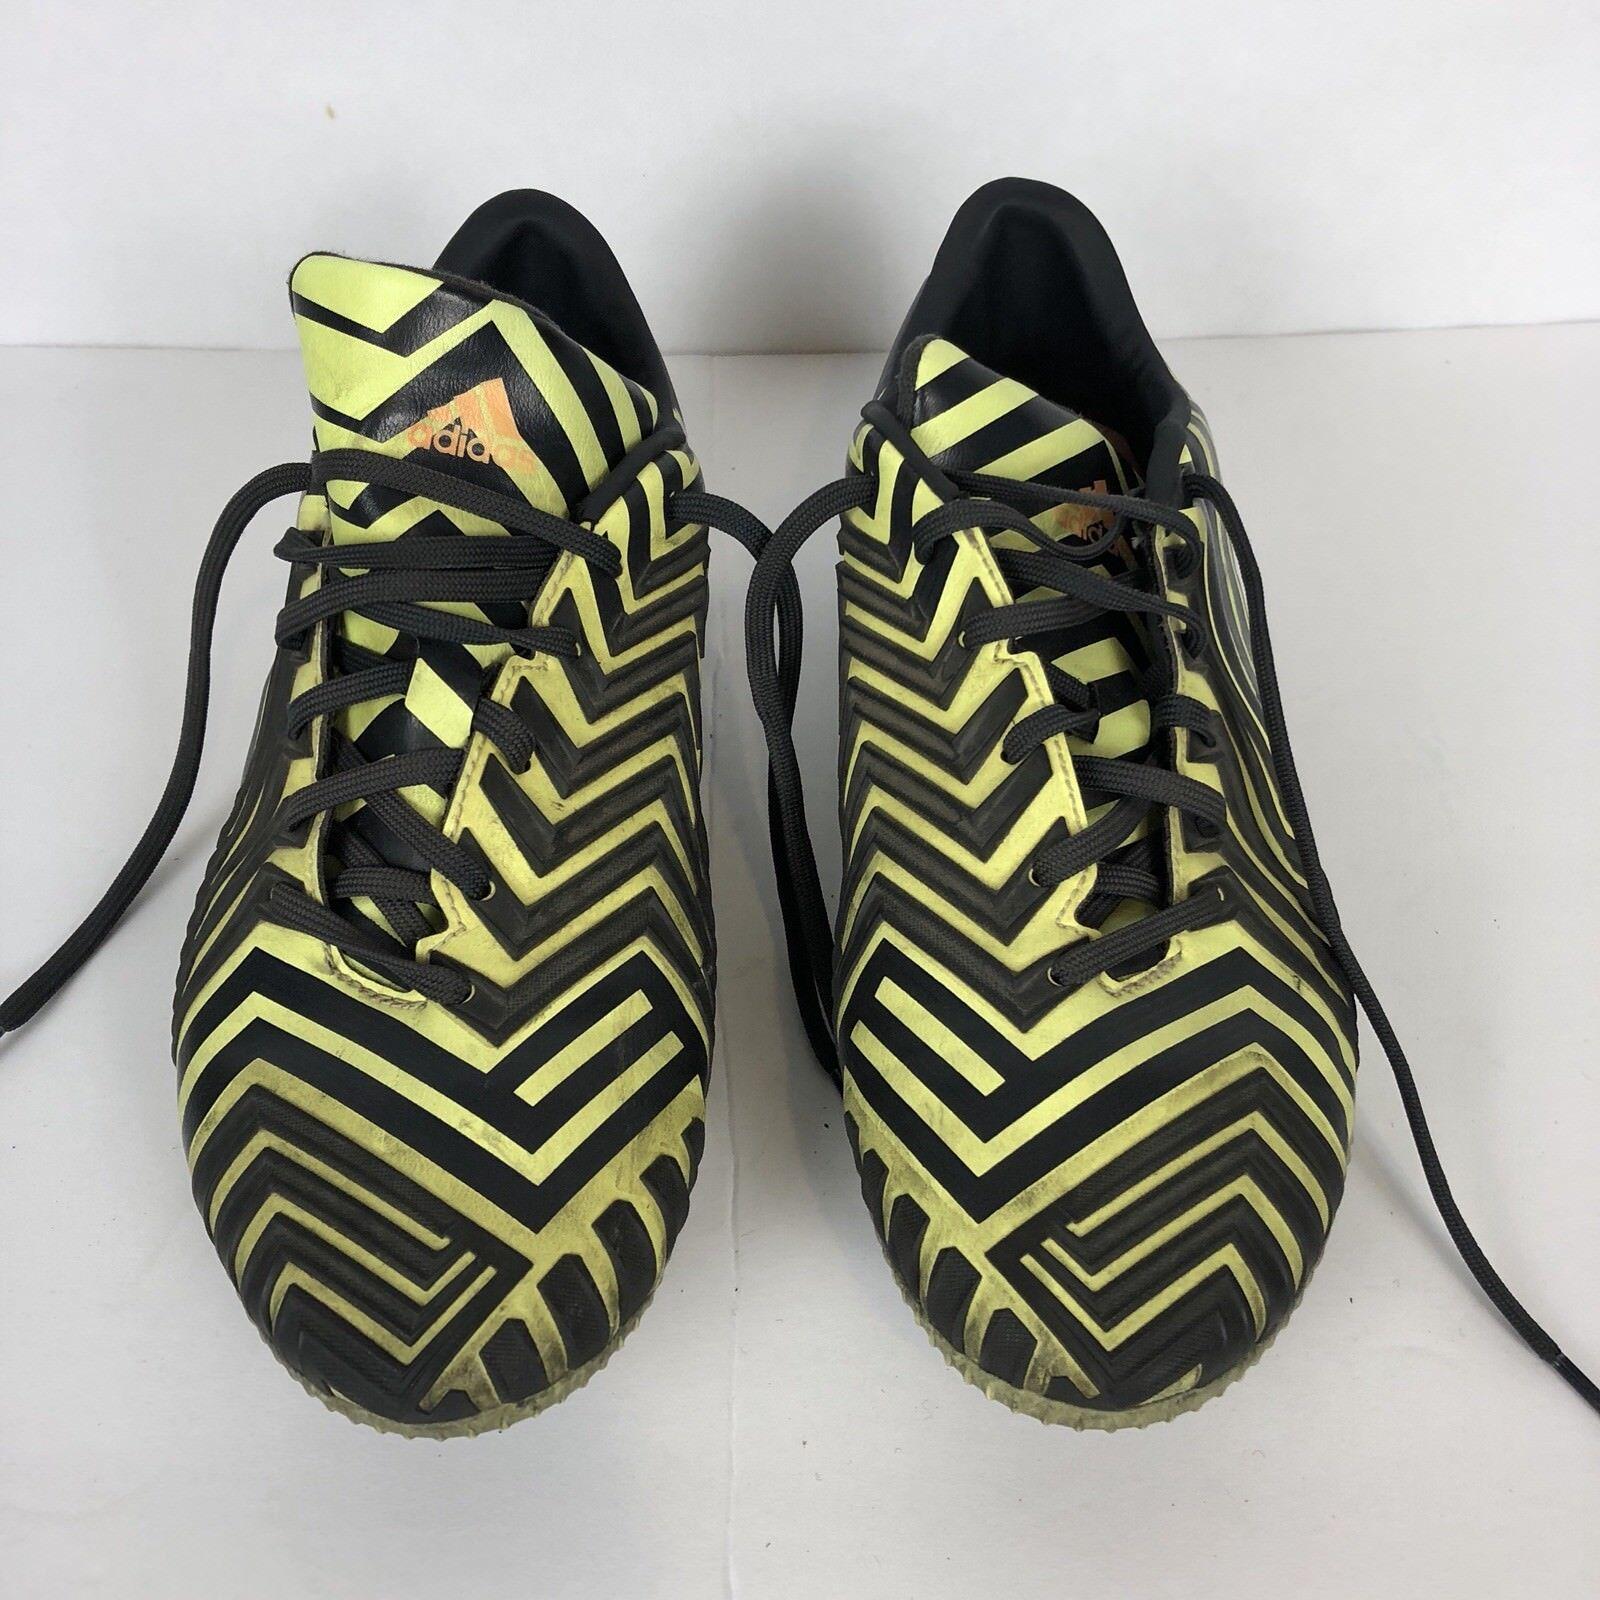 Adidas Mens Predator Cleats Size 9 Male